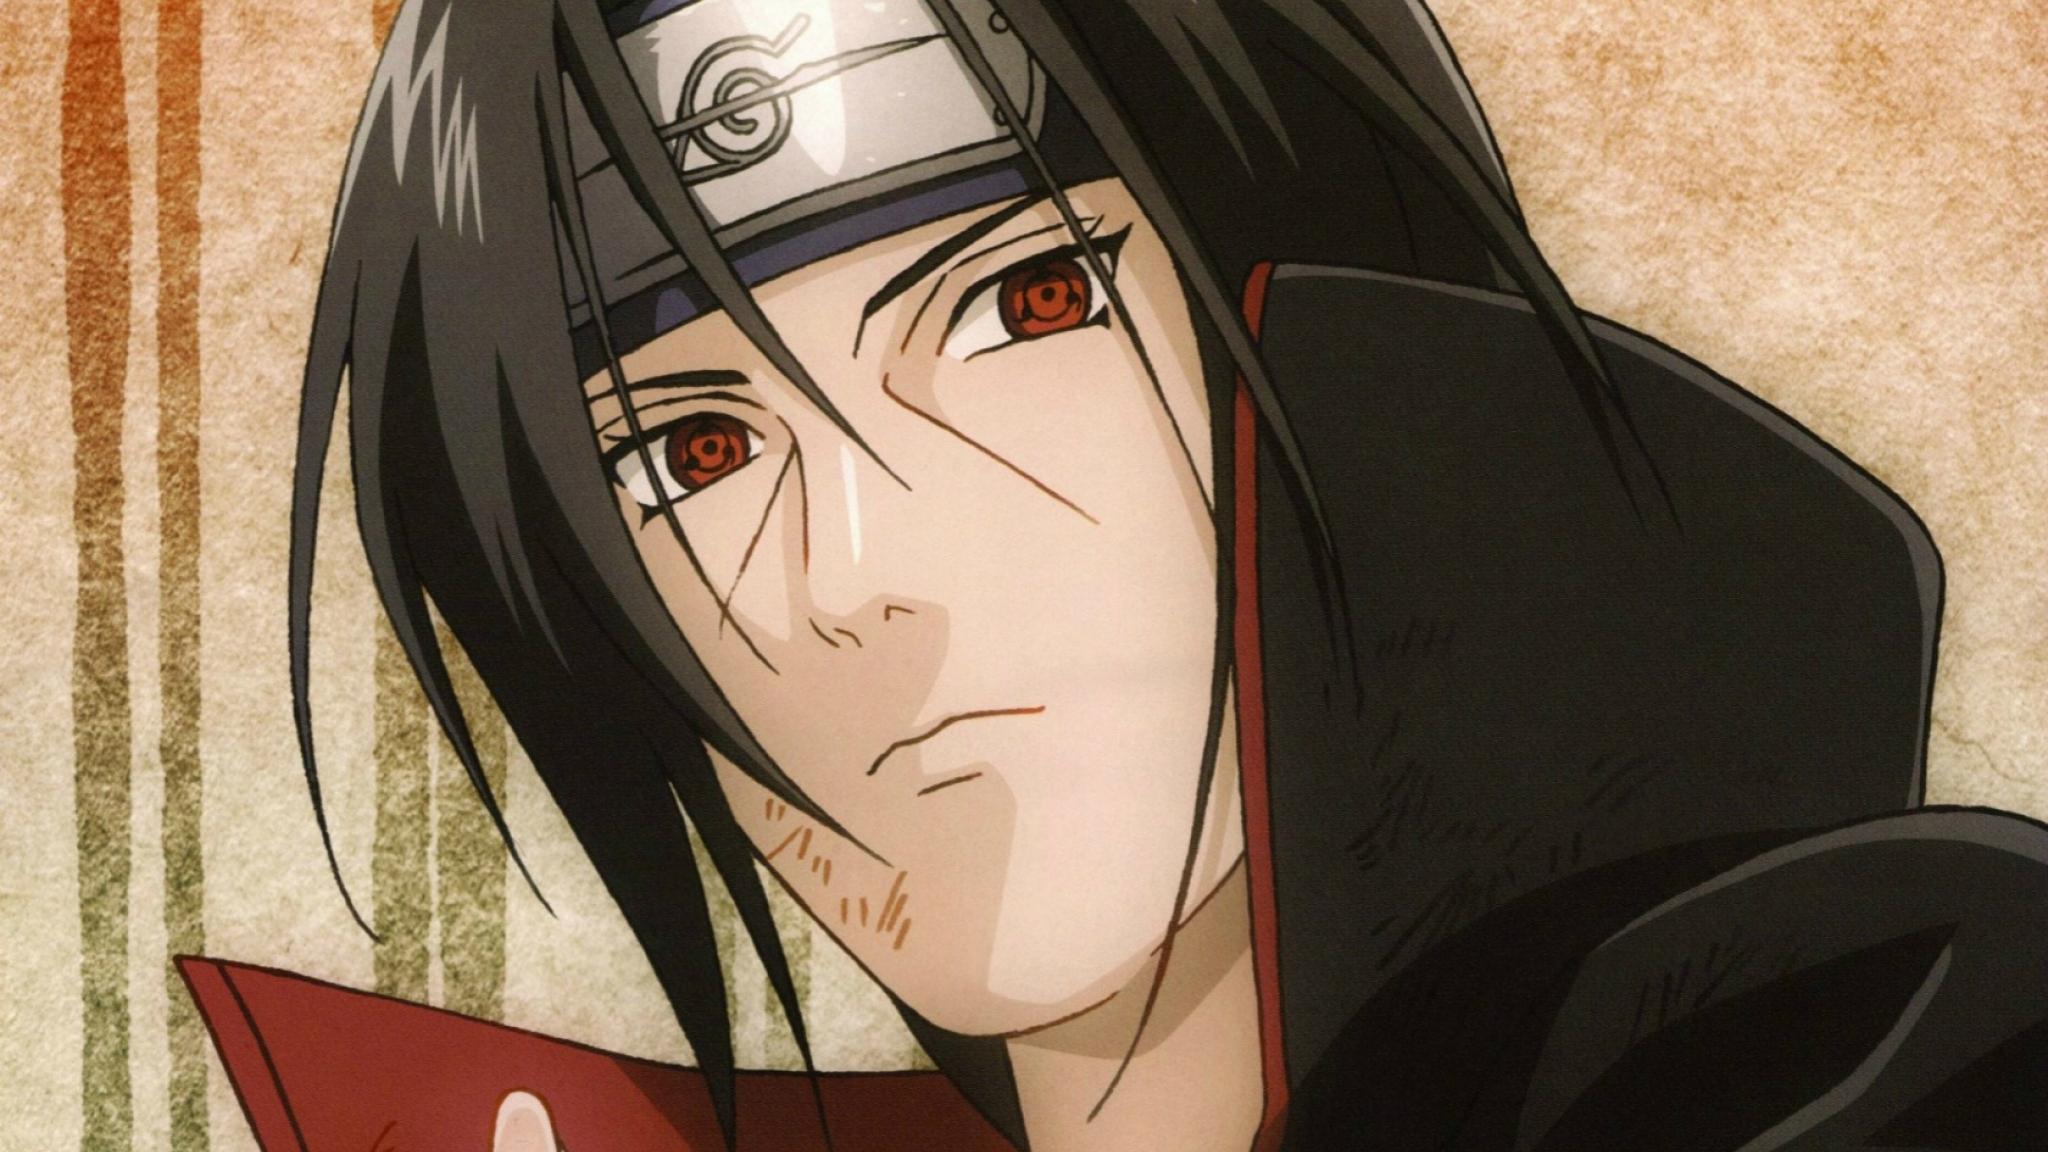 Download Naruto, Itachi Uchiha, Sharingan 1920x1080